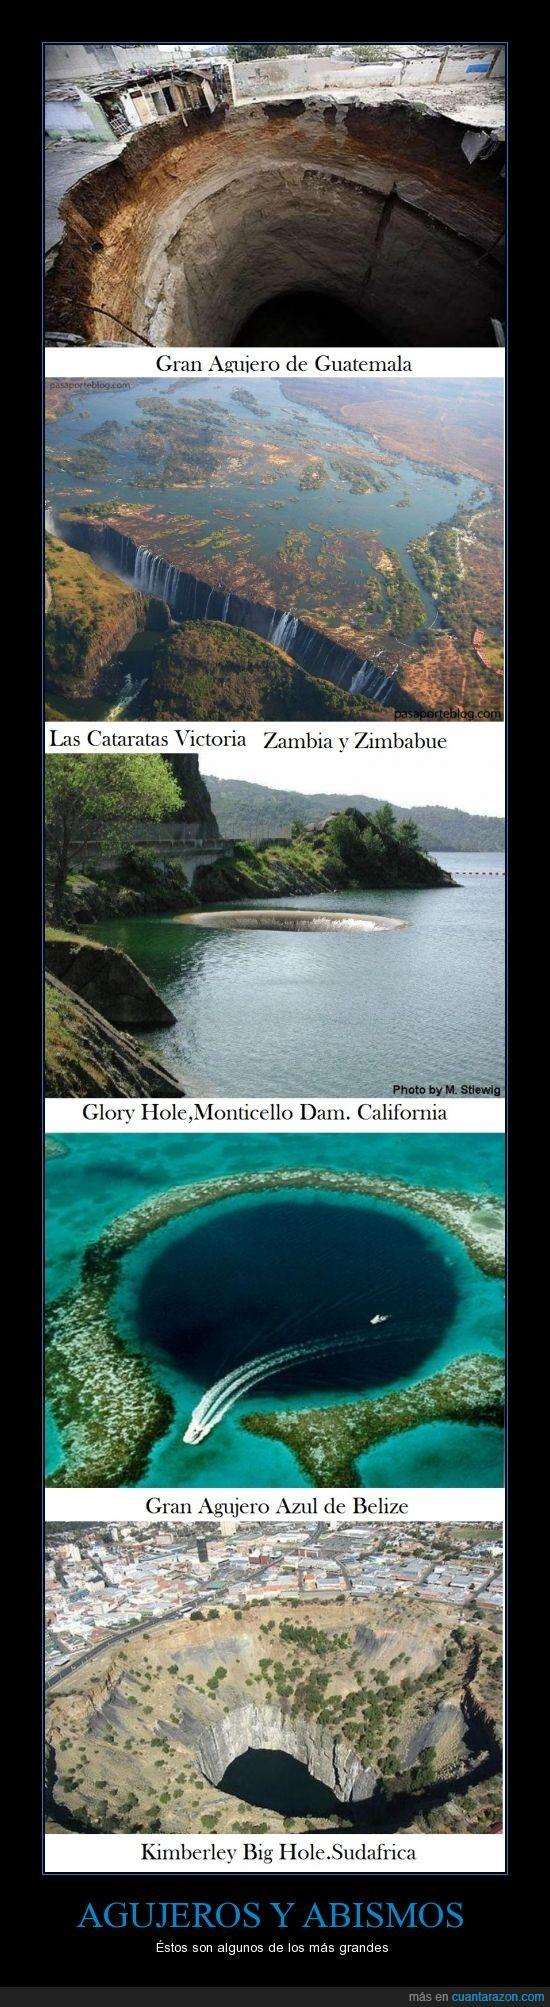 Abismos,Agujeros,Belize,Guatemala,Sudafrica